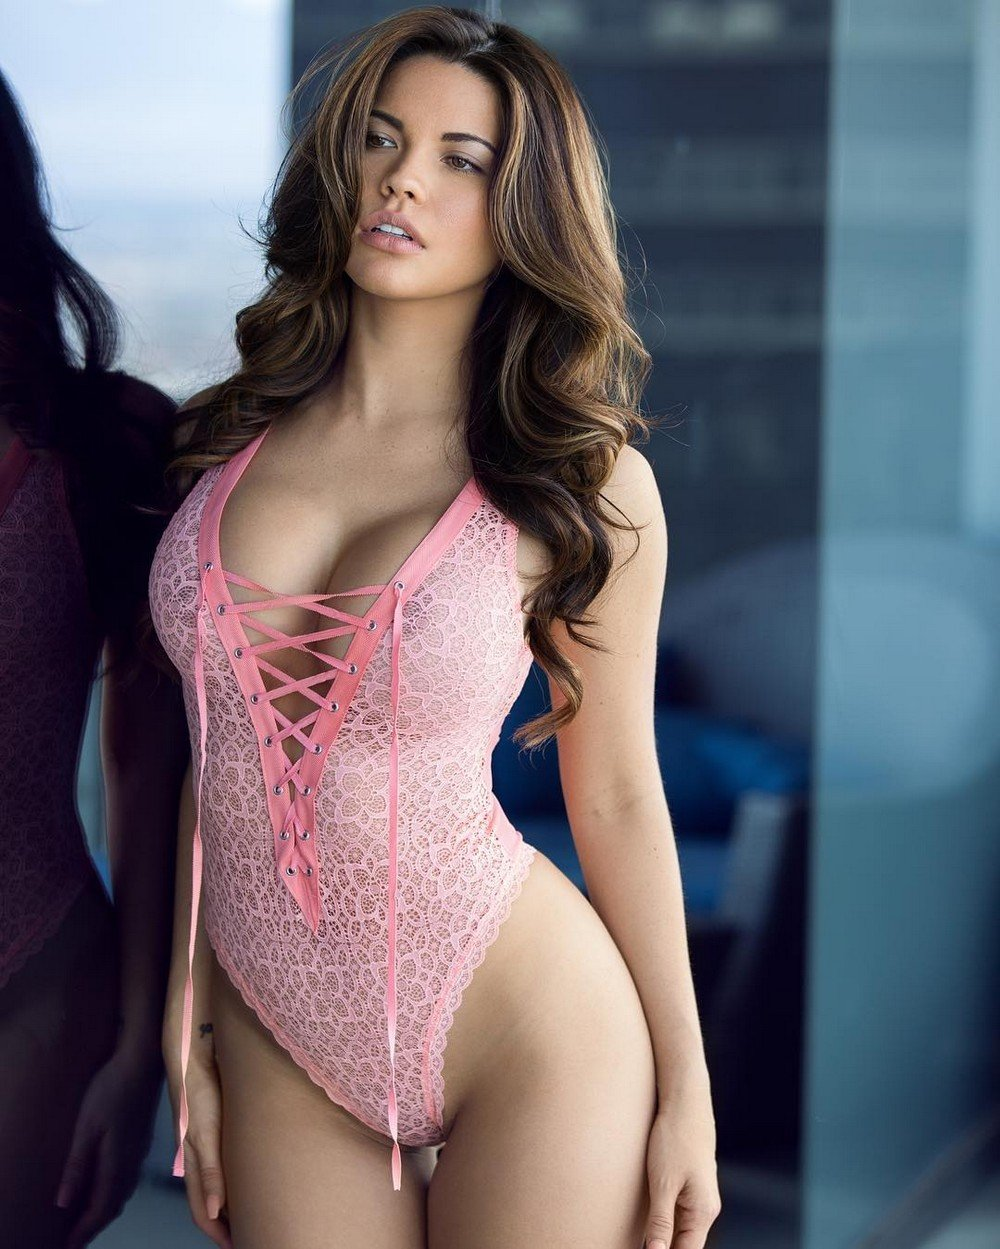 Hot sexywomens video — 13